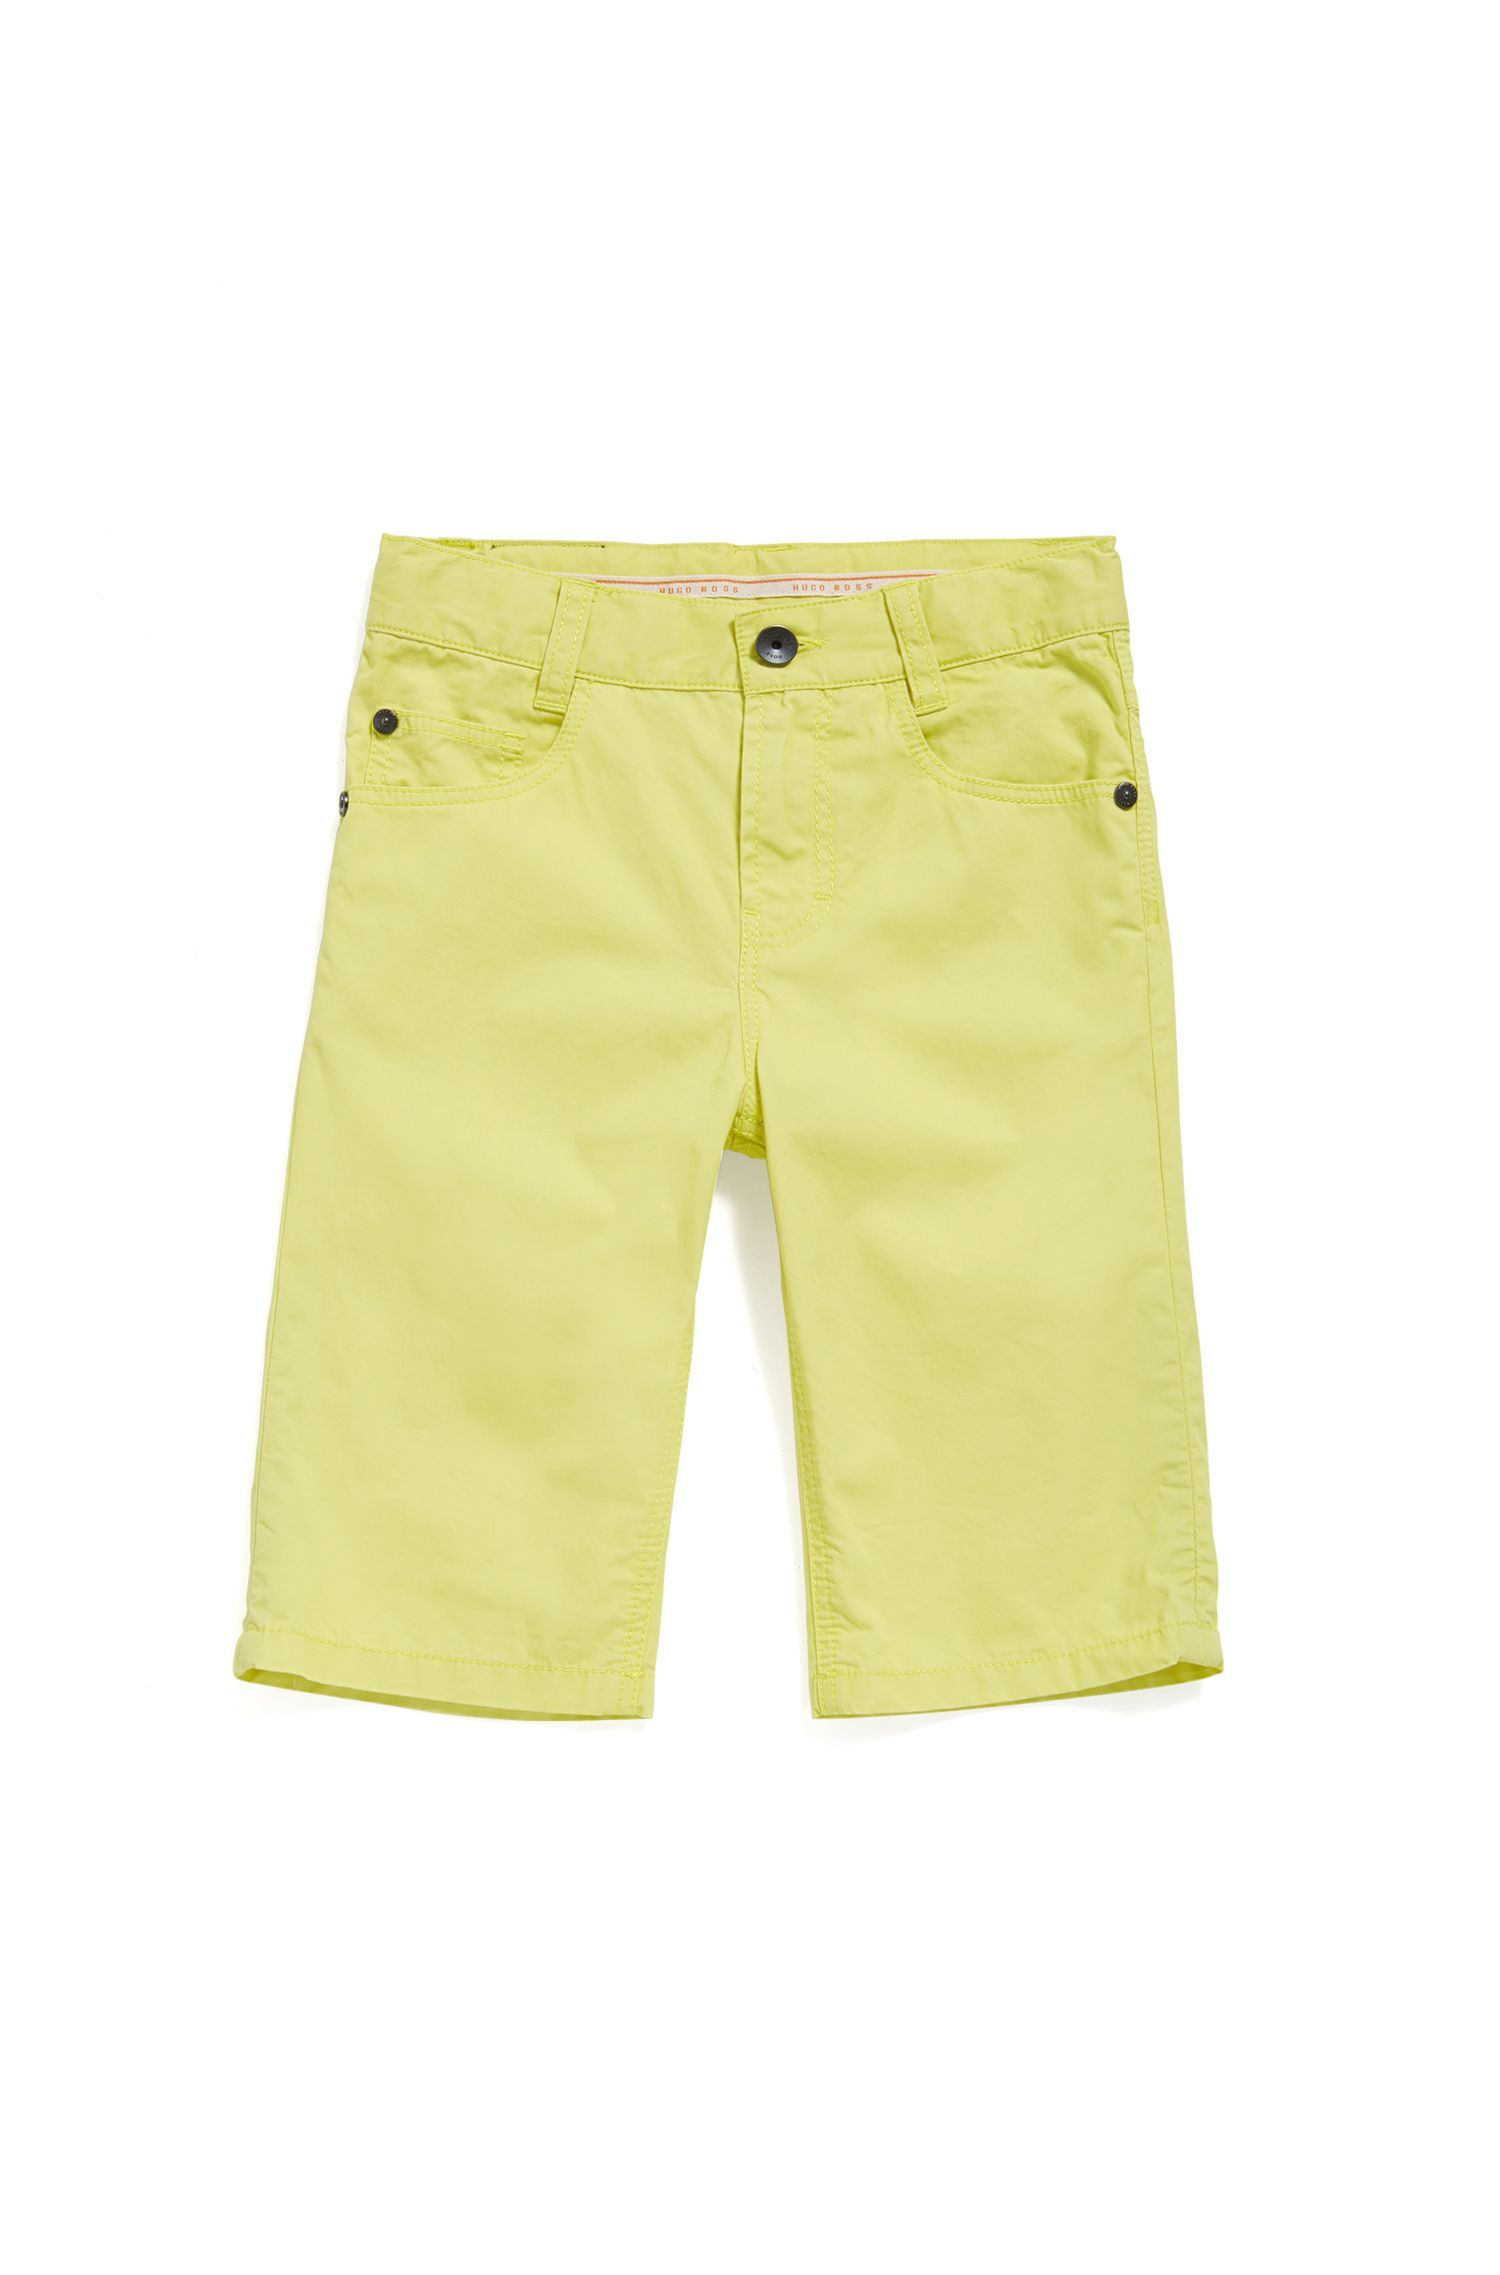 Shorts para niño en algodón con estilo de cinco bolsillos: 'J24433'